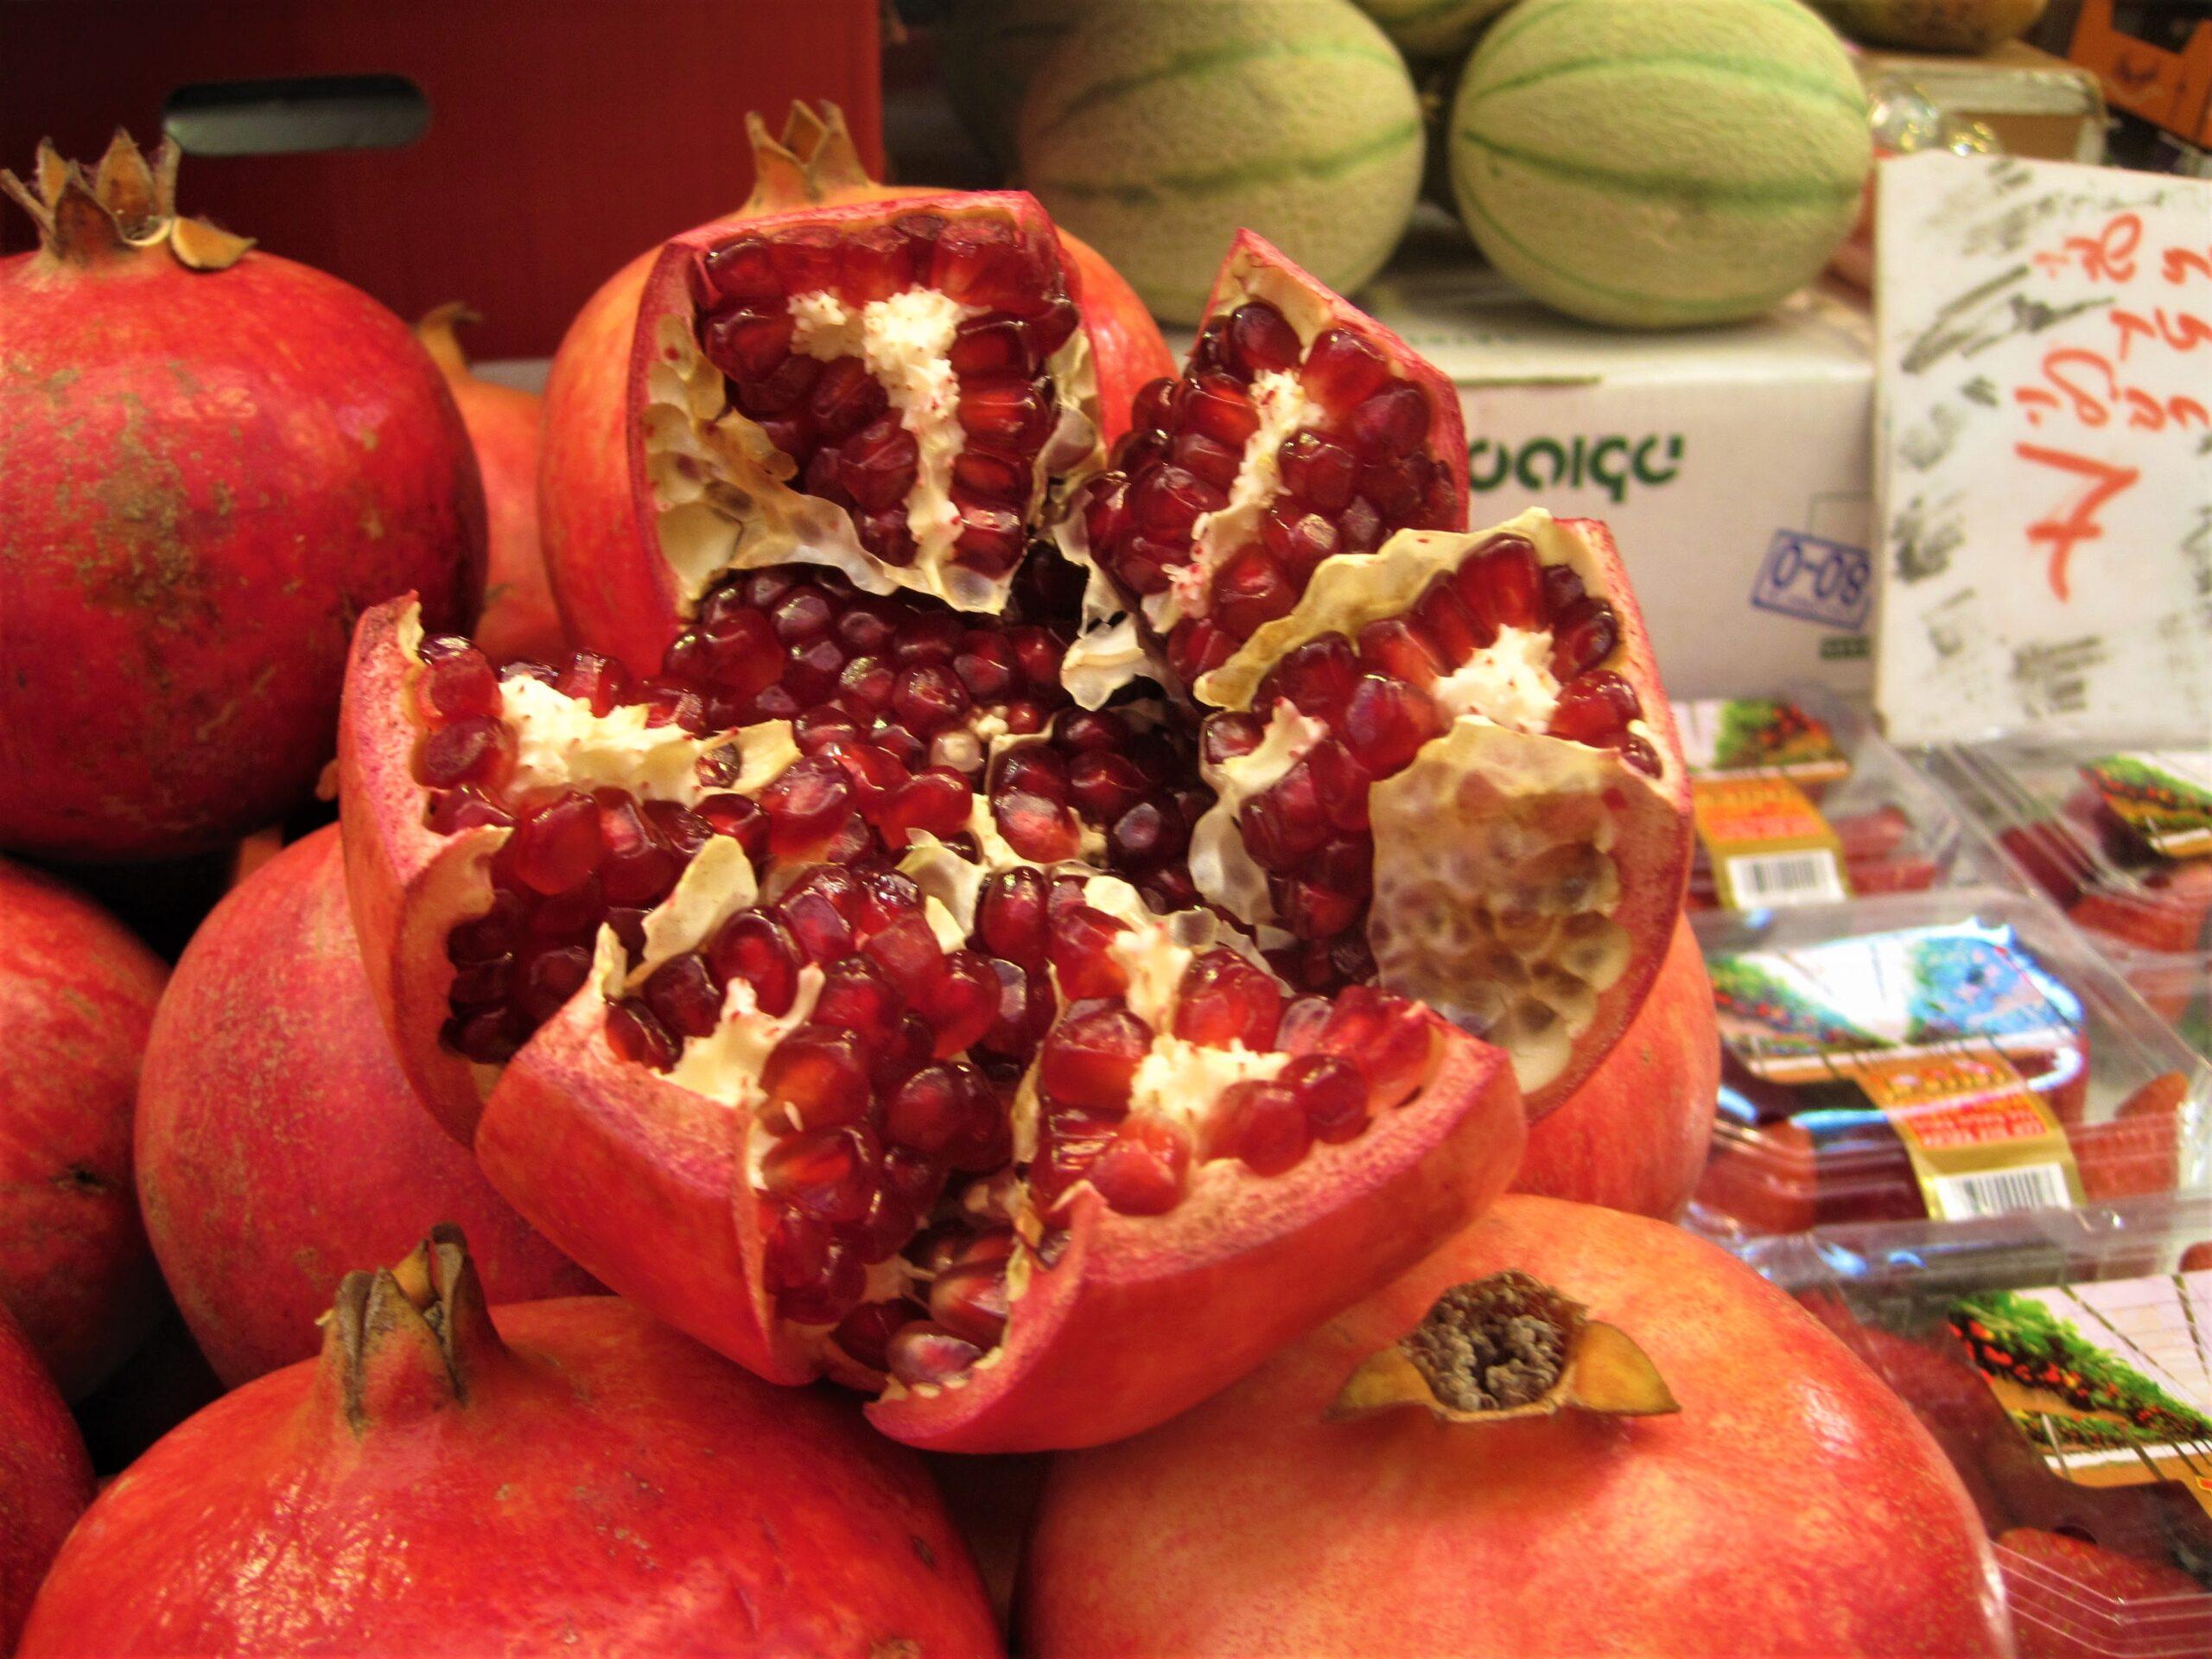 Pomegranate in Machaneh Yehuda